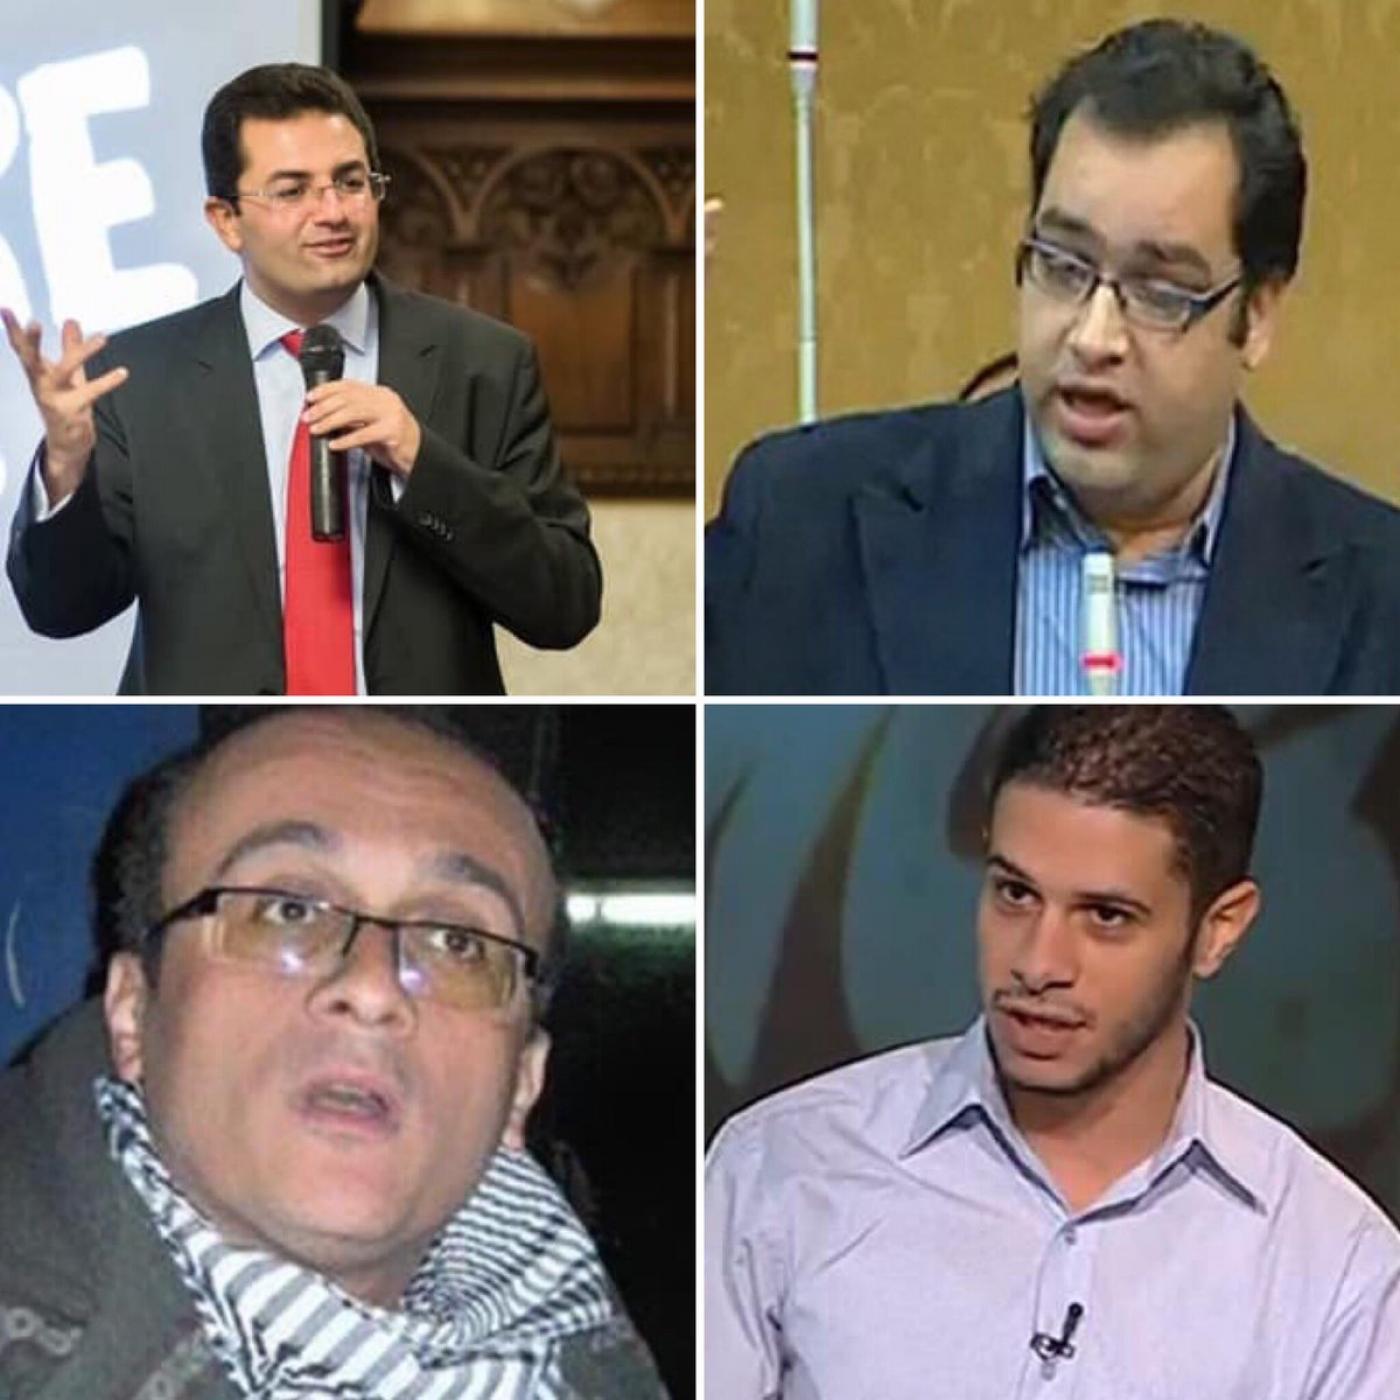 Egypt Rounds up Prominent Leftist Activists, Journalists